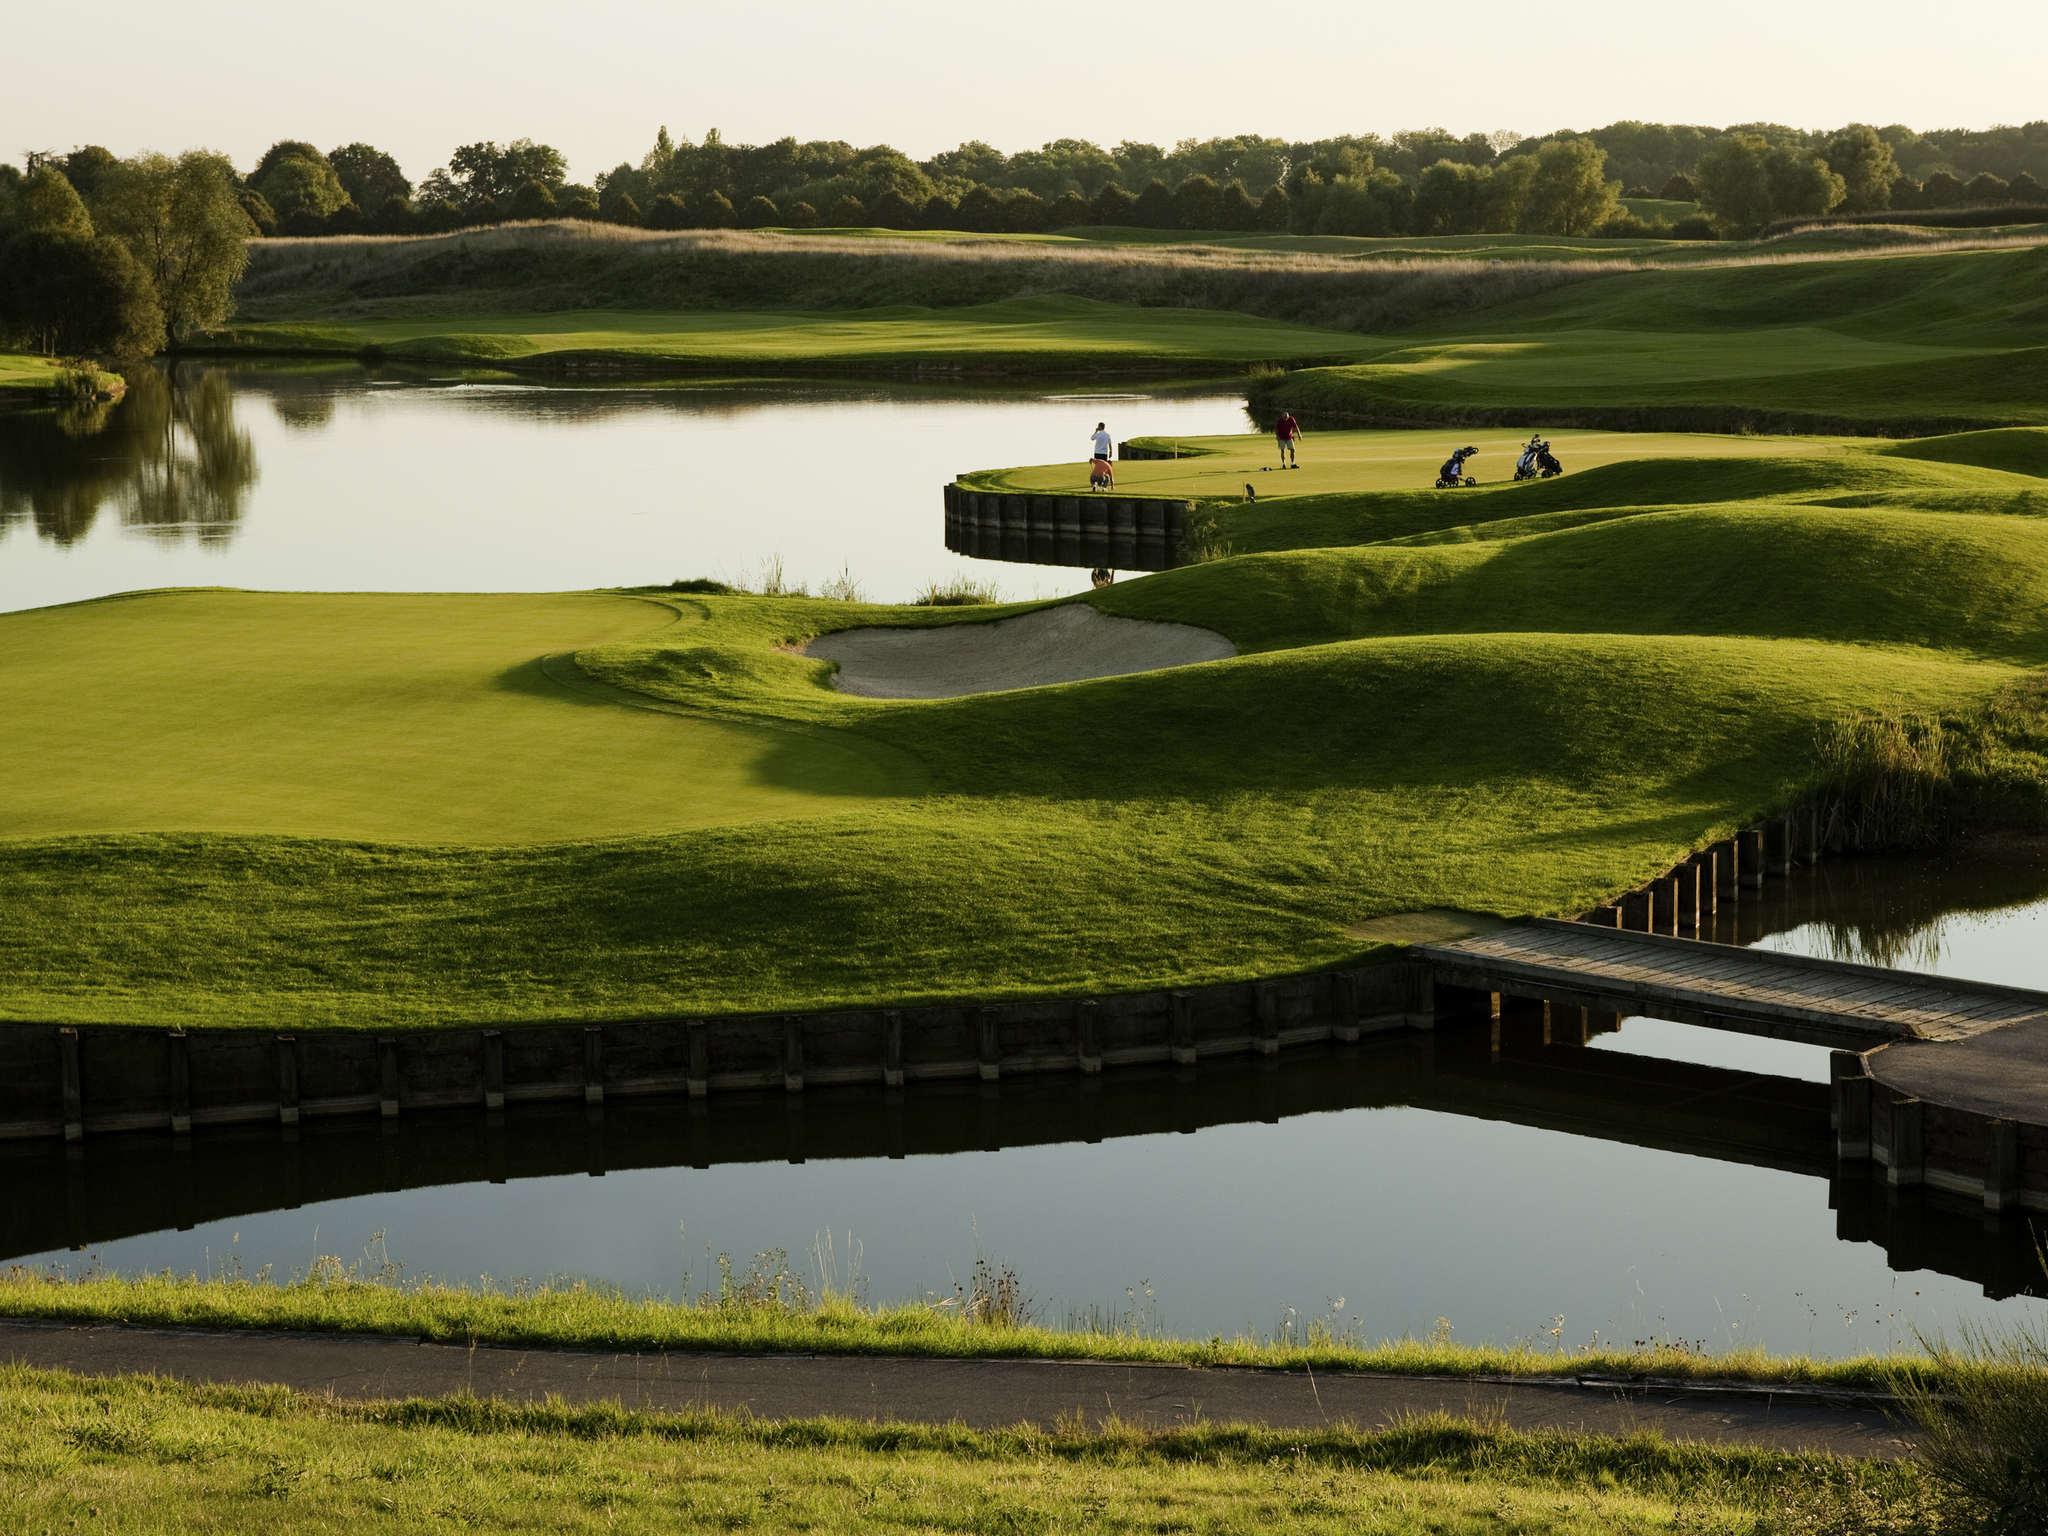 فندق - Novotel Saint-Quentin Golf National